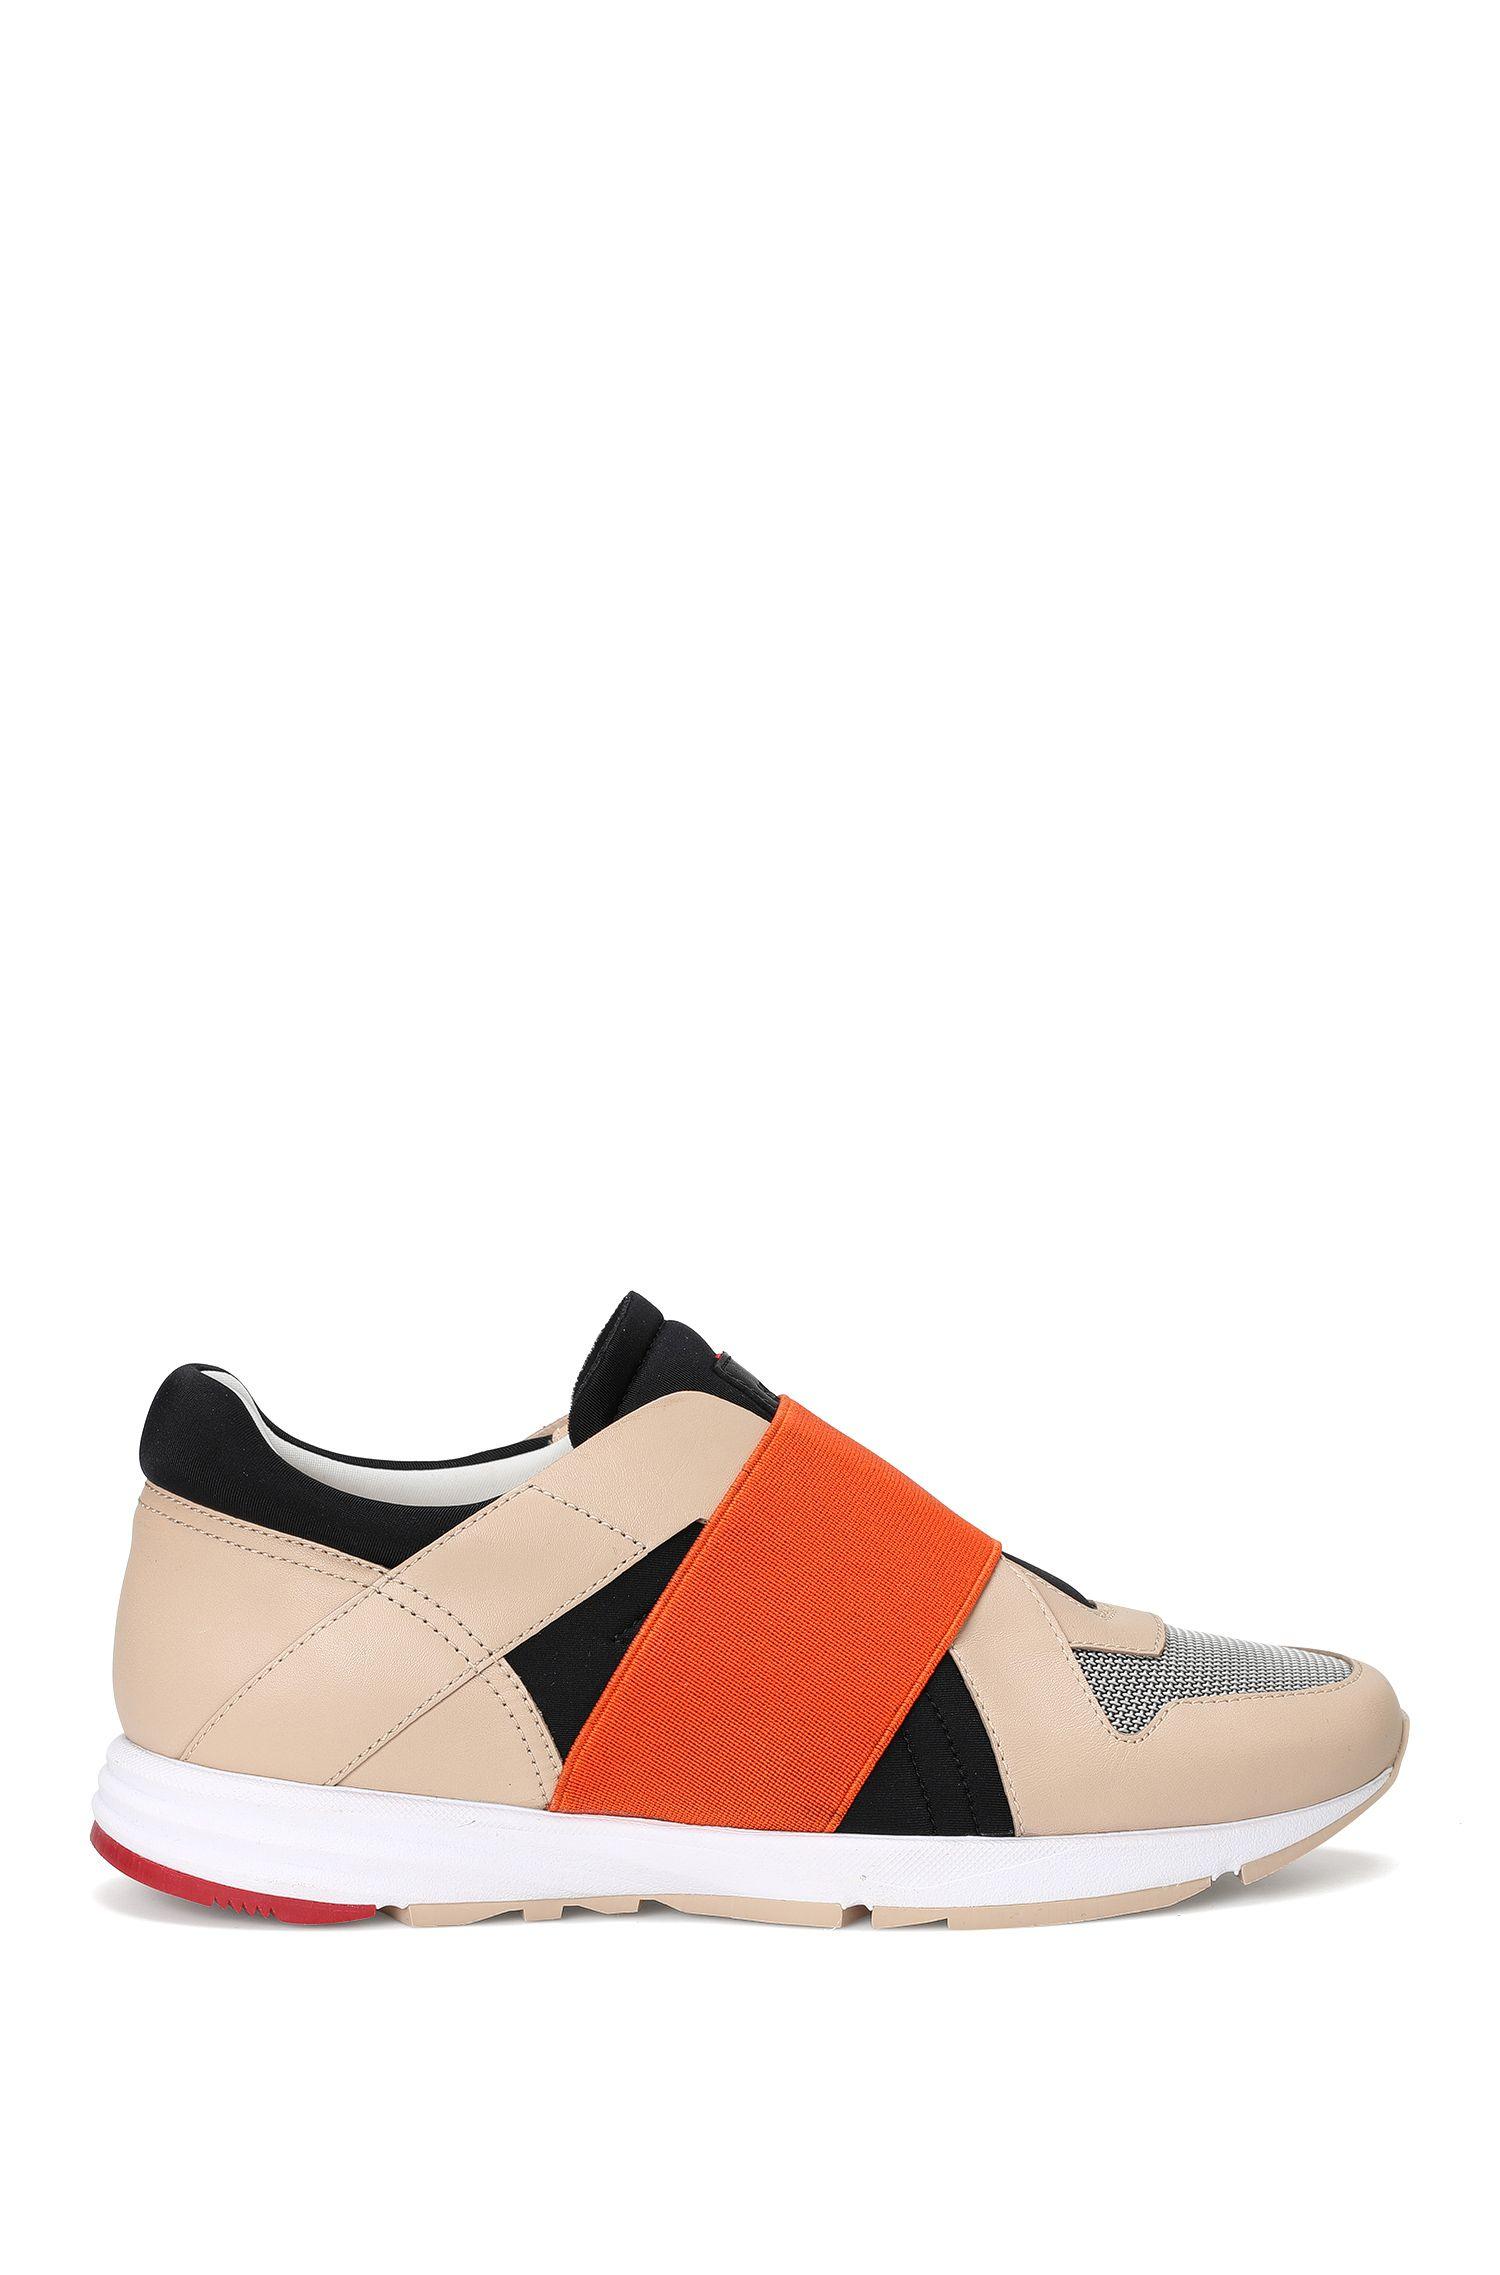 Sneakers aus Leder mit Elastik-Besatz: 'Asya-E'